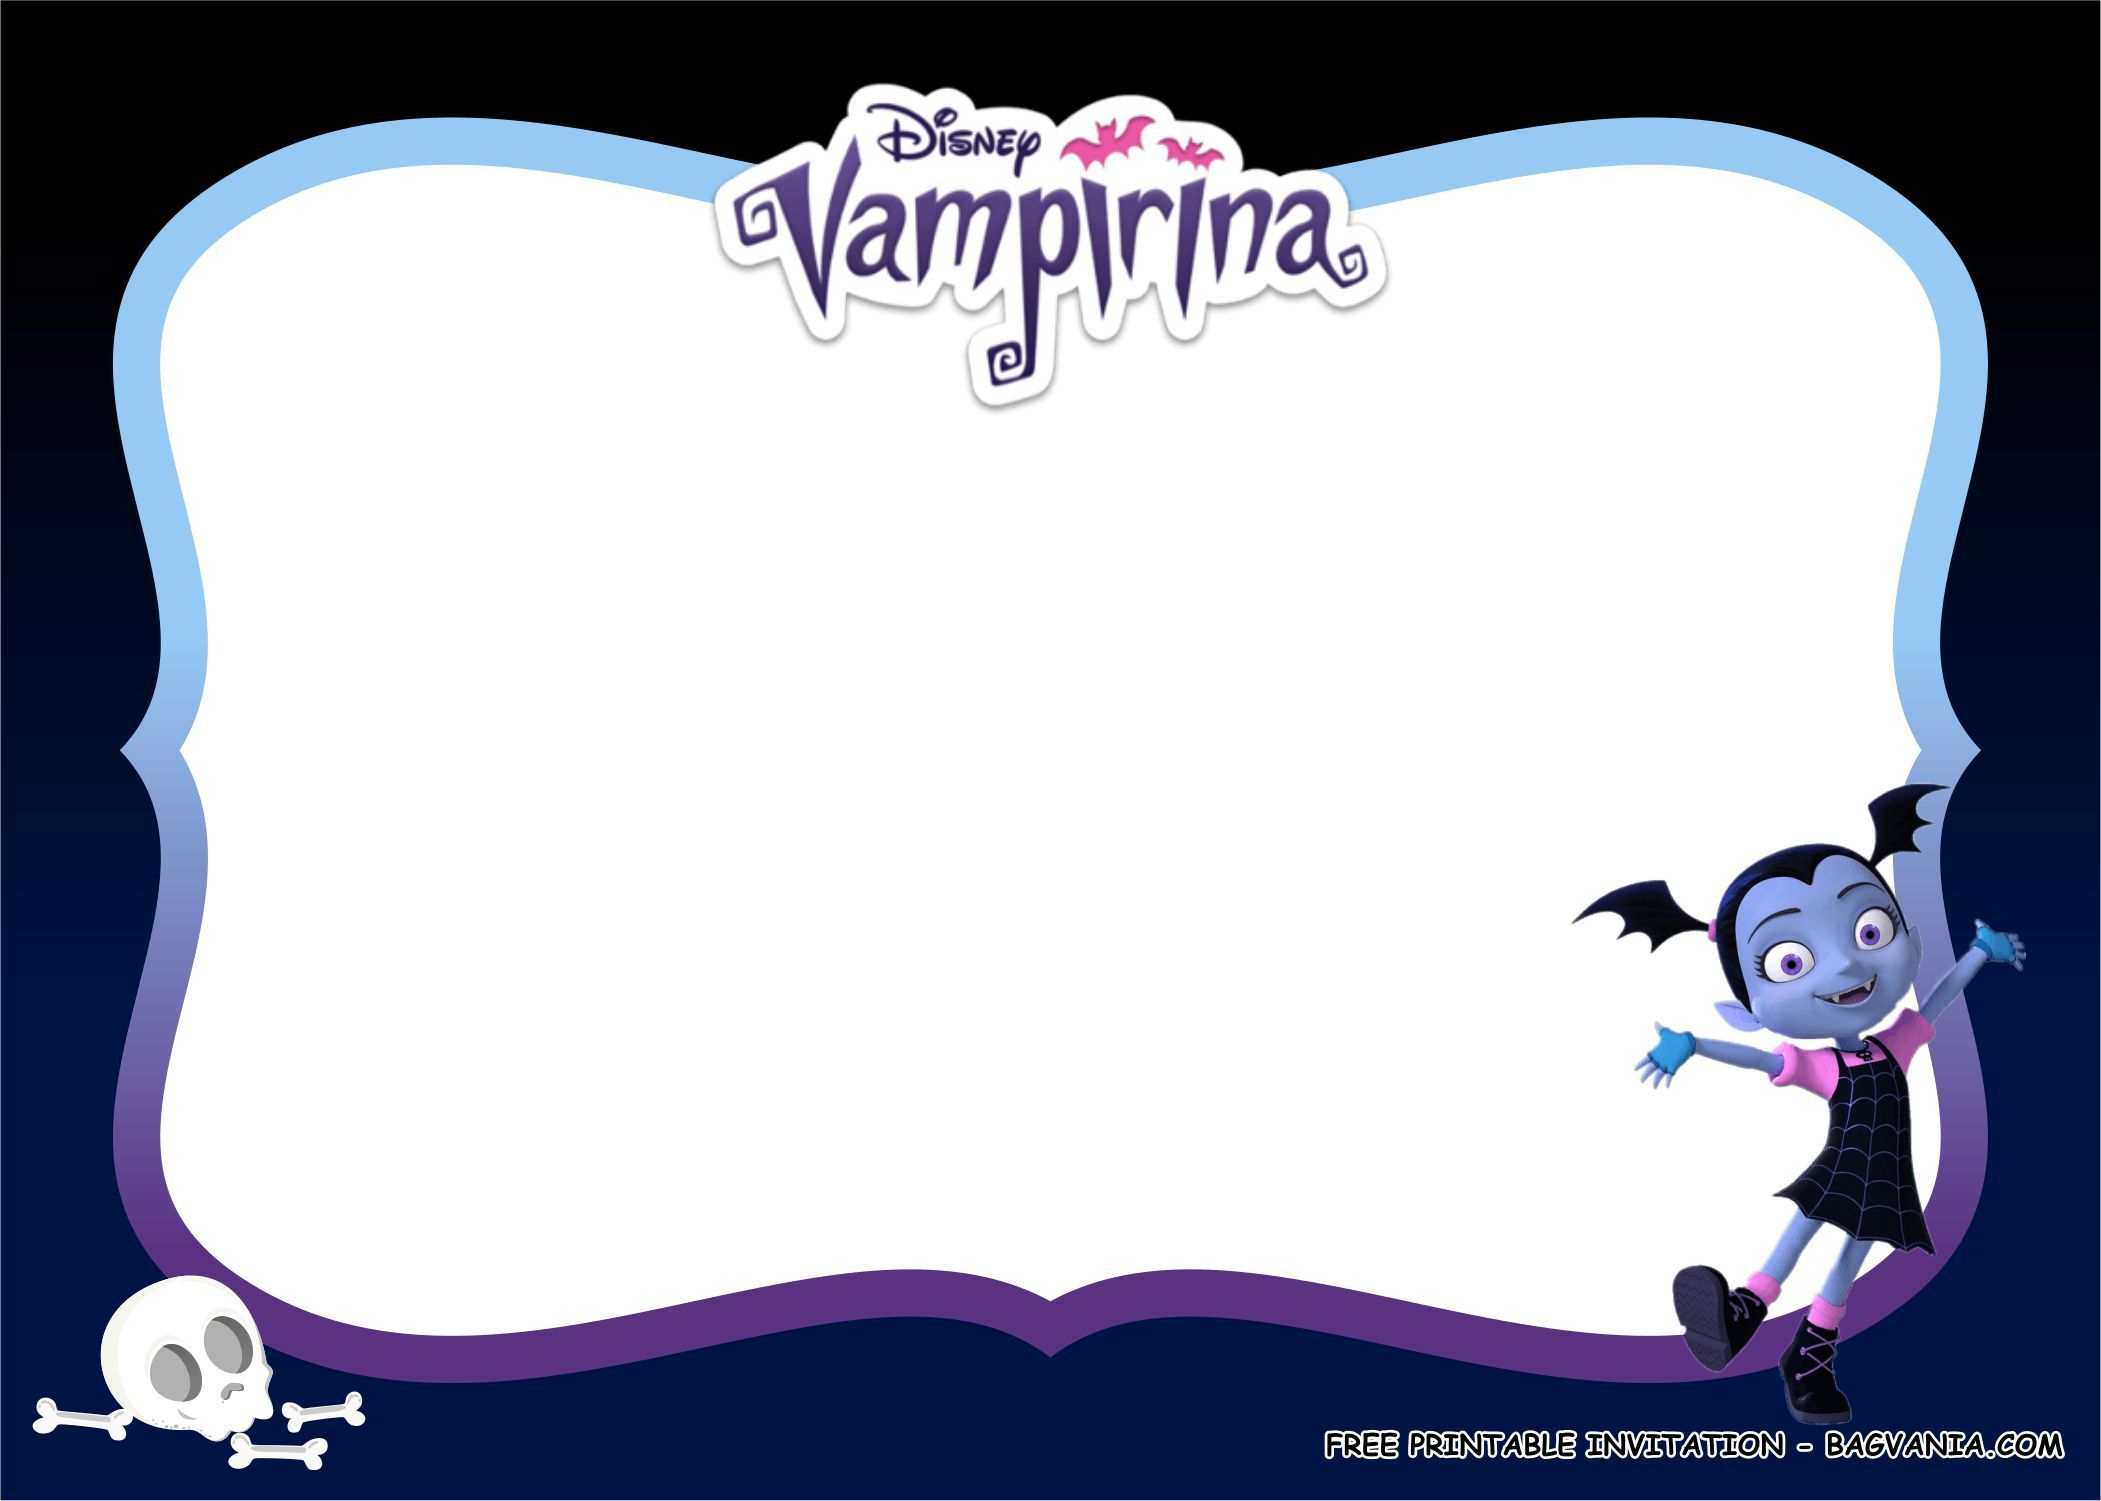 FREE PRINTABLE) - Vampirina Birthday Party Kits Template